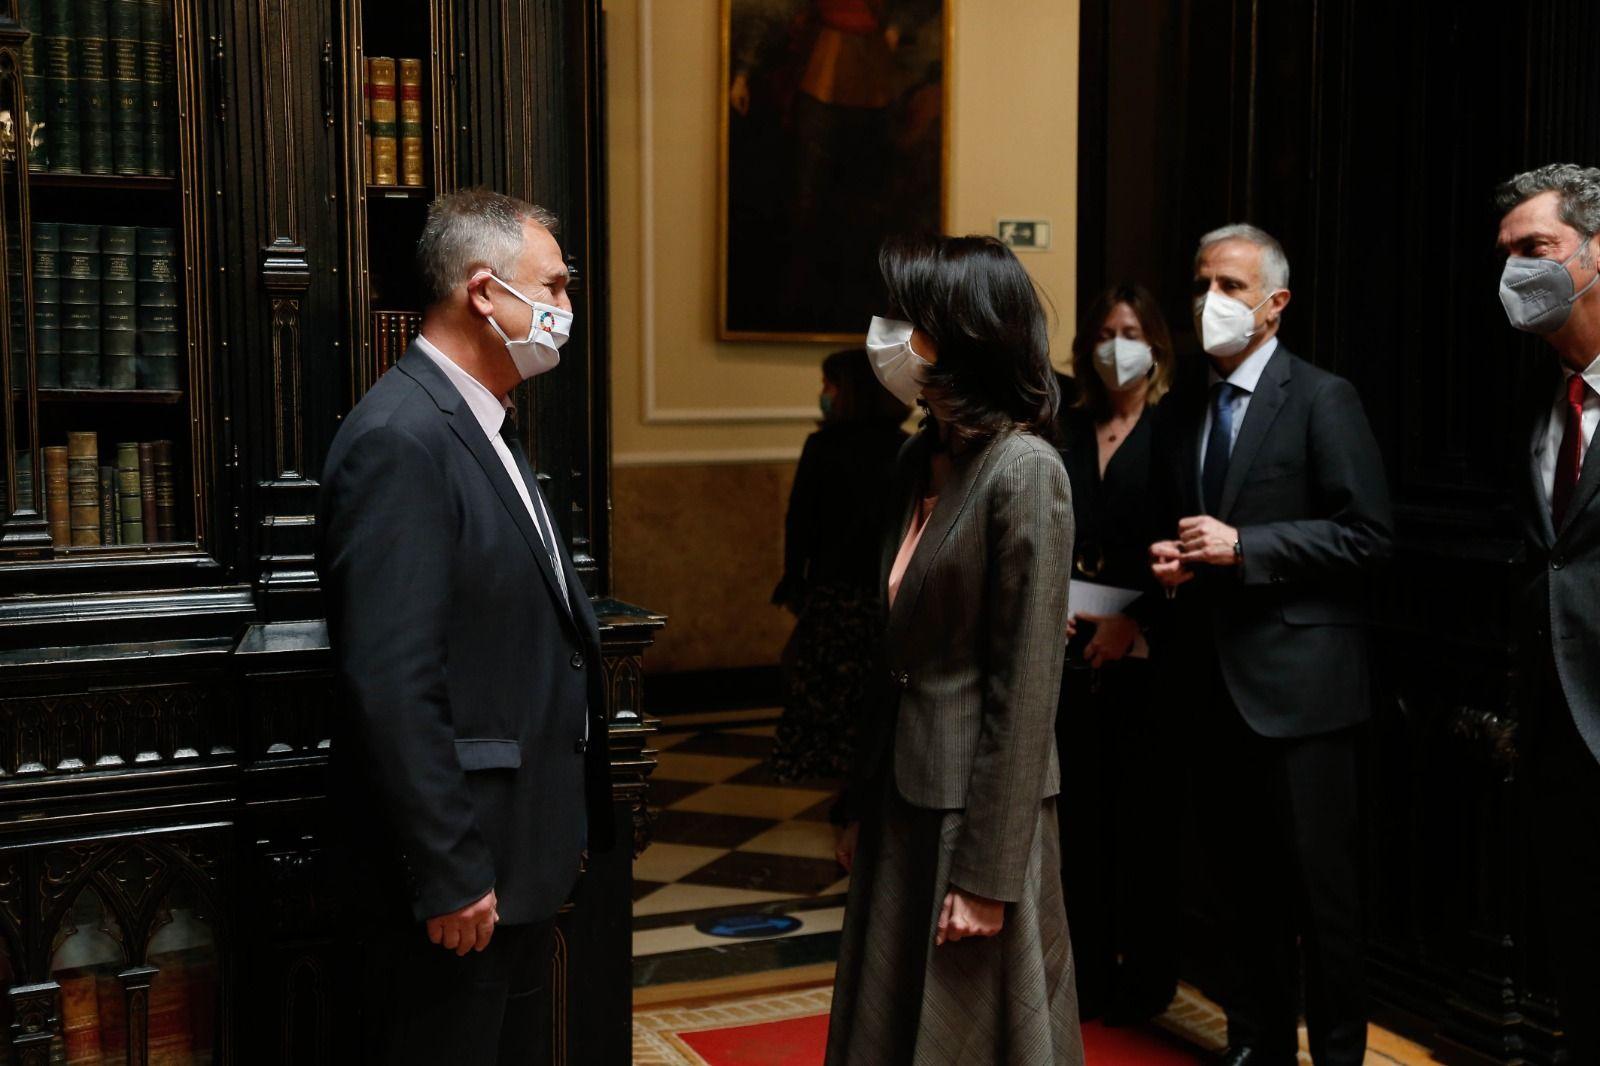 La presidenta de la Cámara Alta, Pilar Llop, saluda al alcalde de Llíria, Manuel Civera.